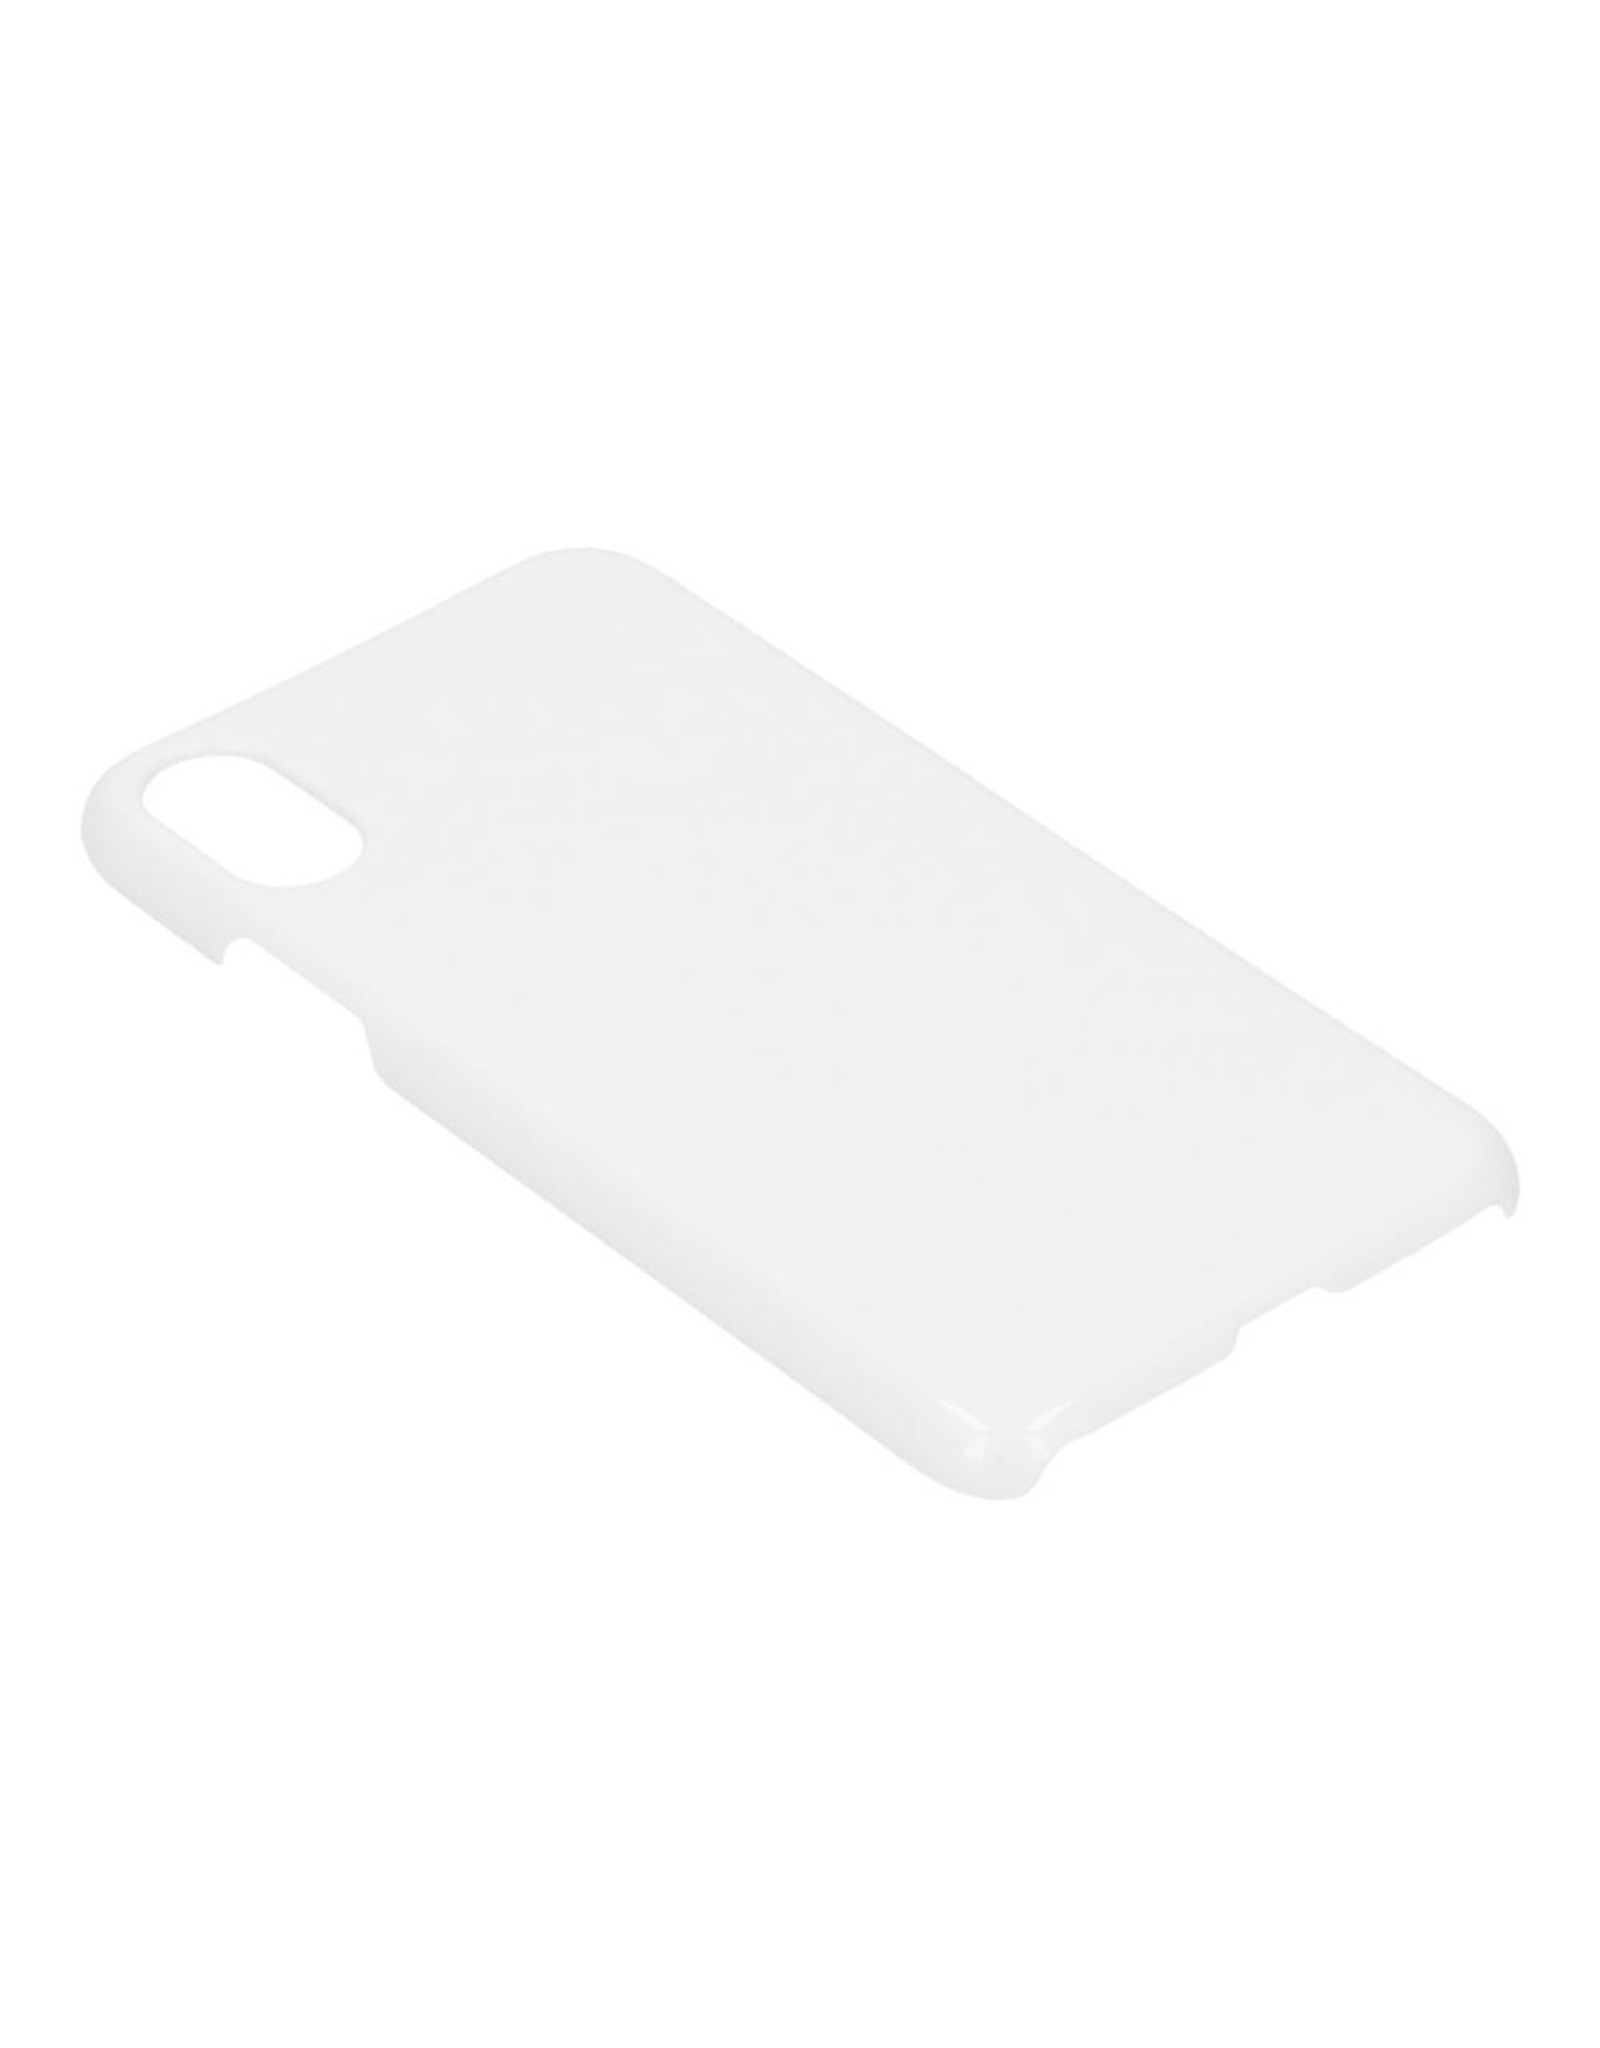 3D iPhone XR